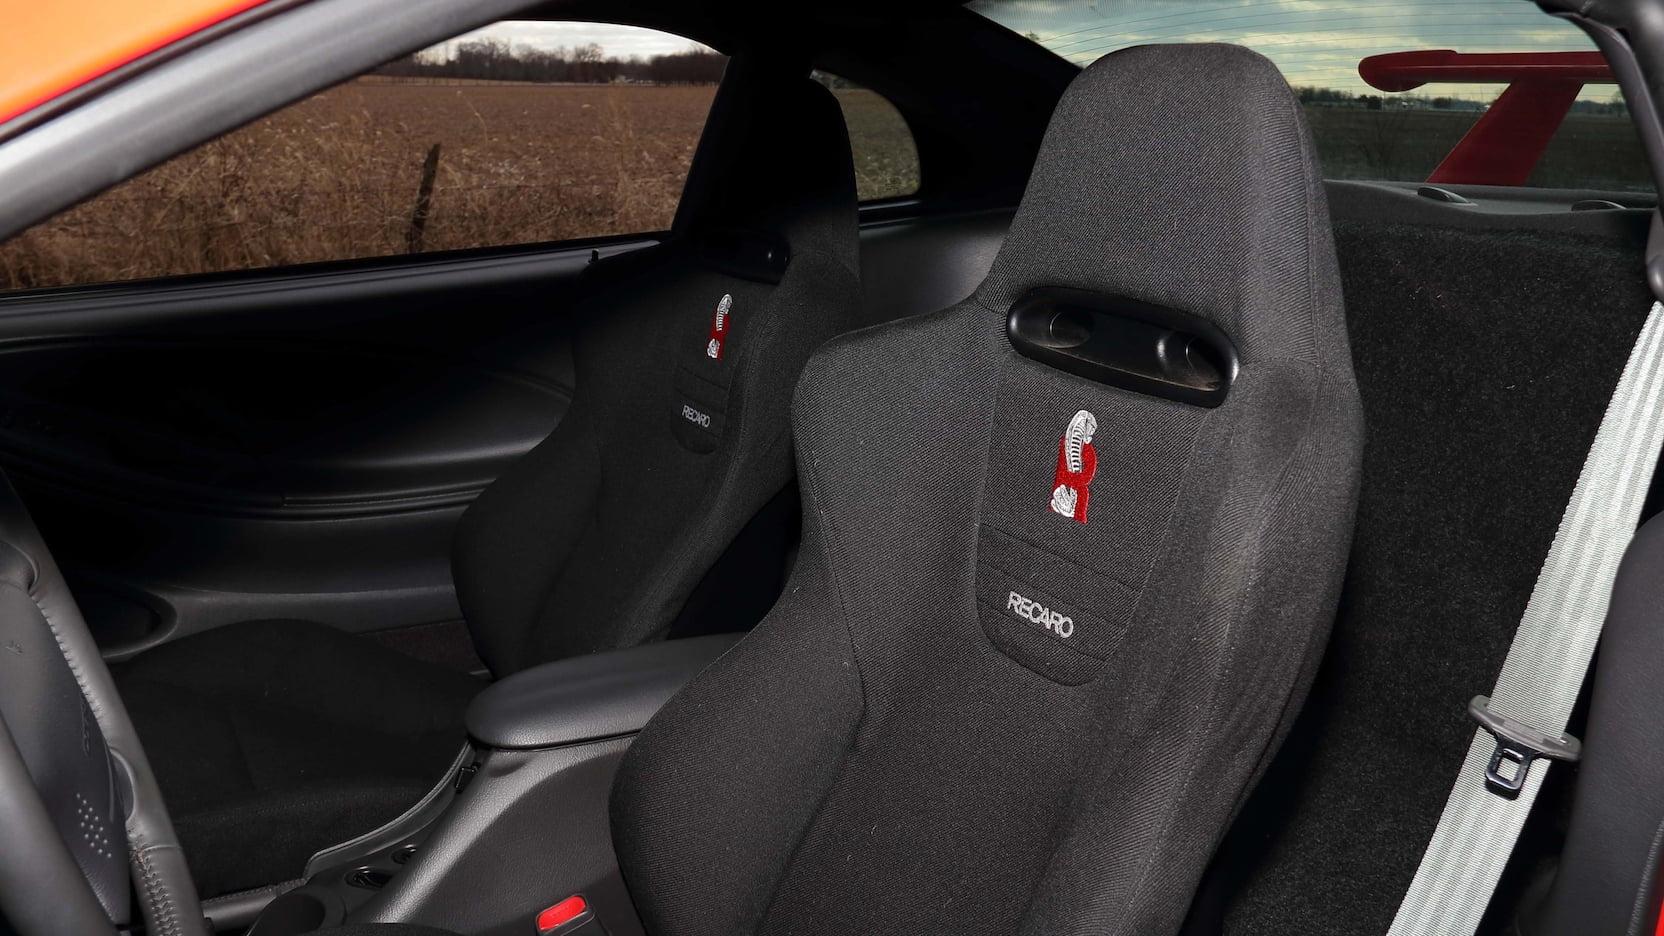 2000 Cobra R interior